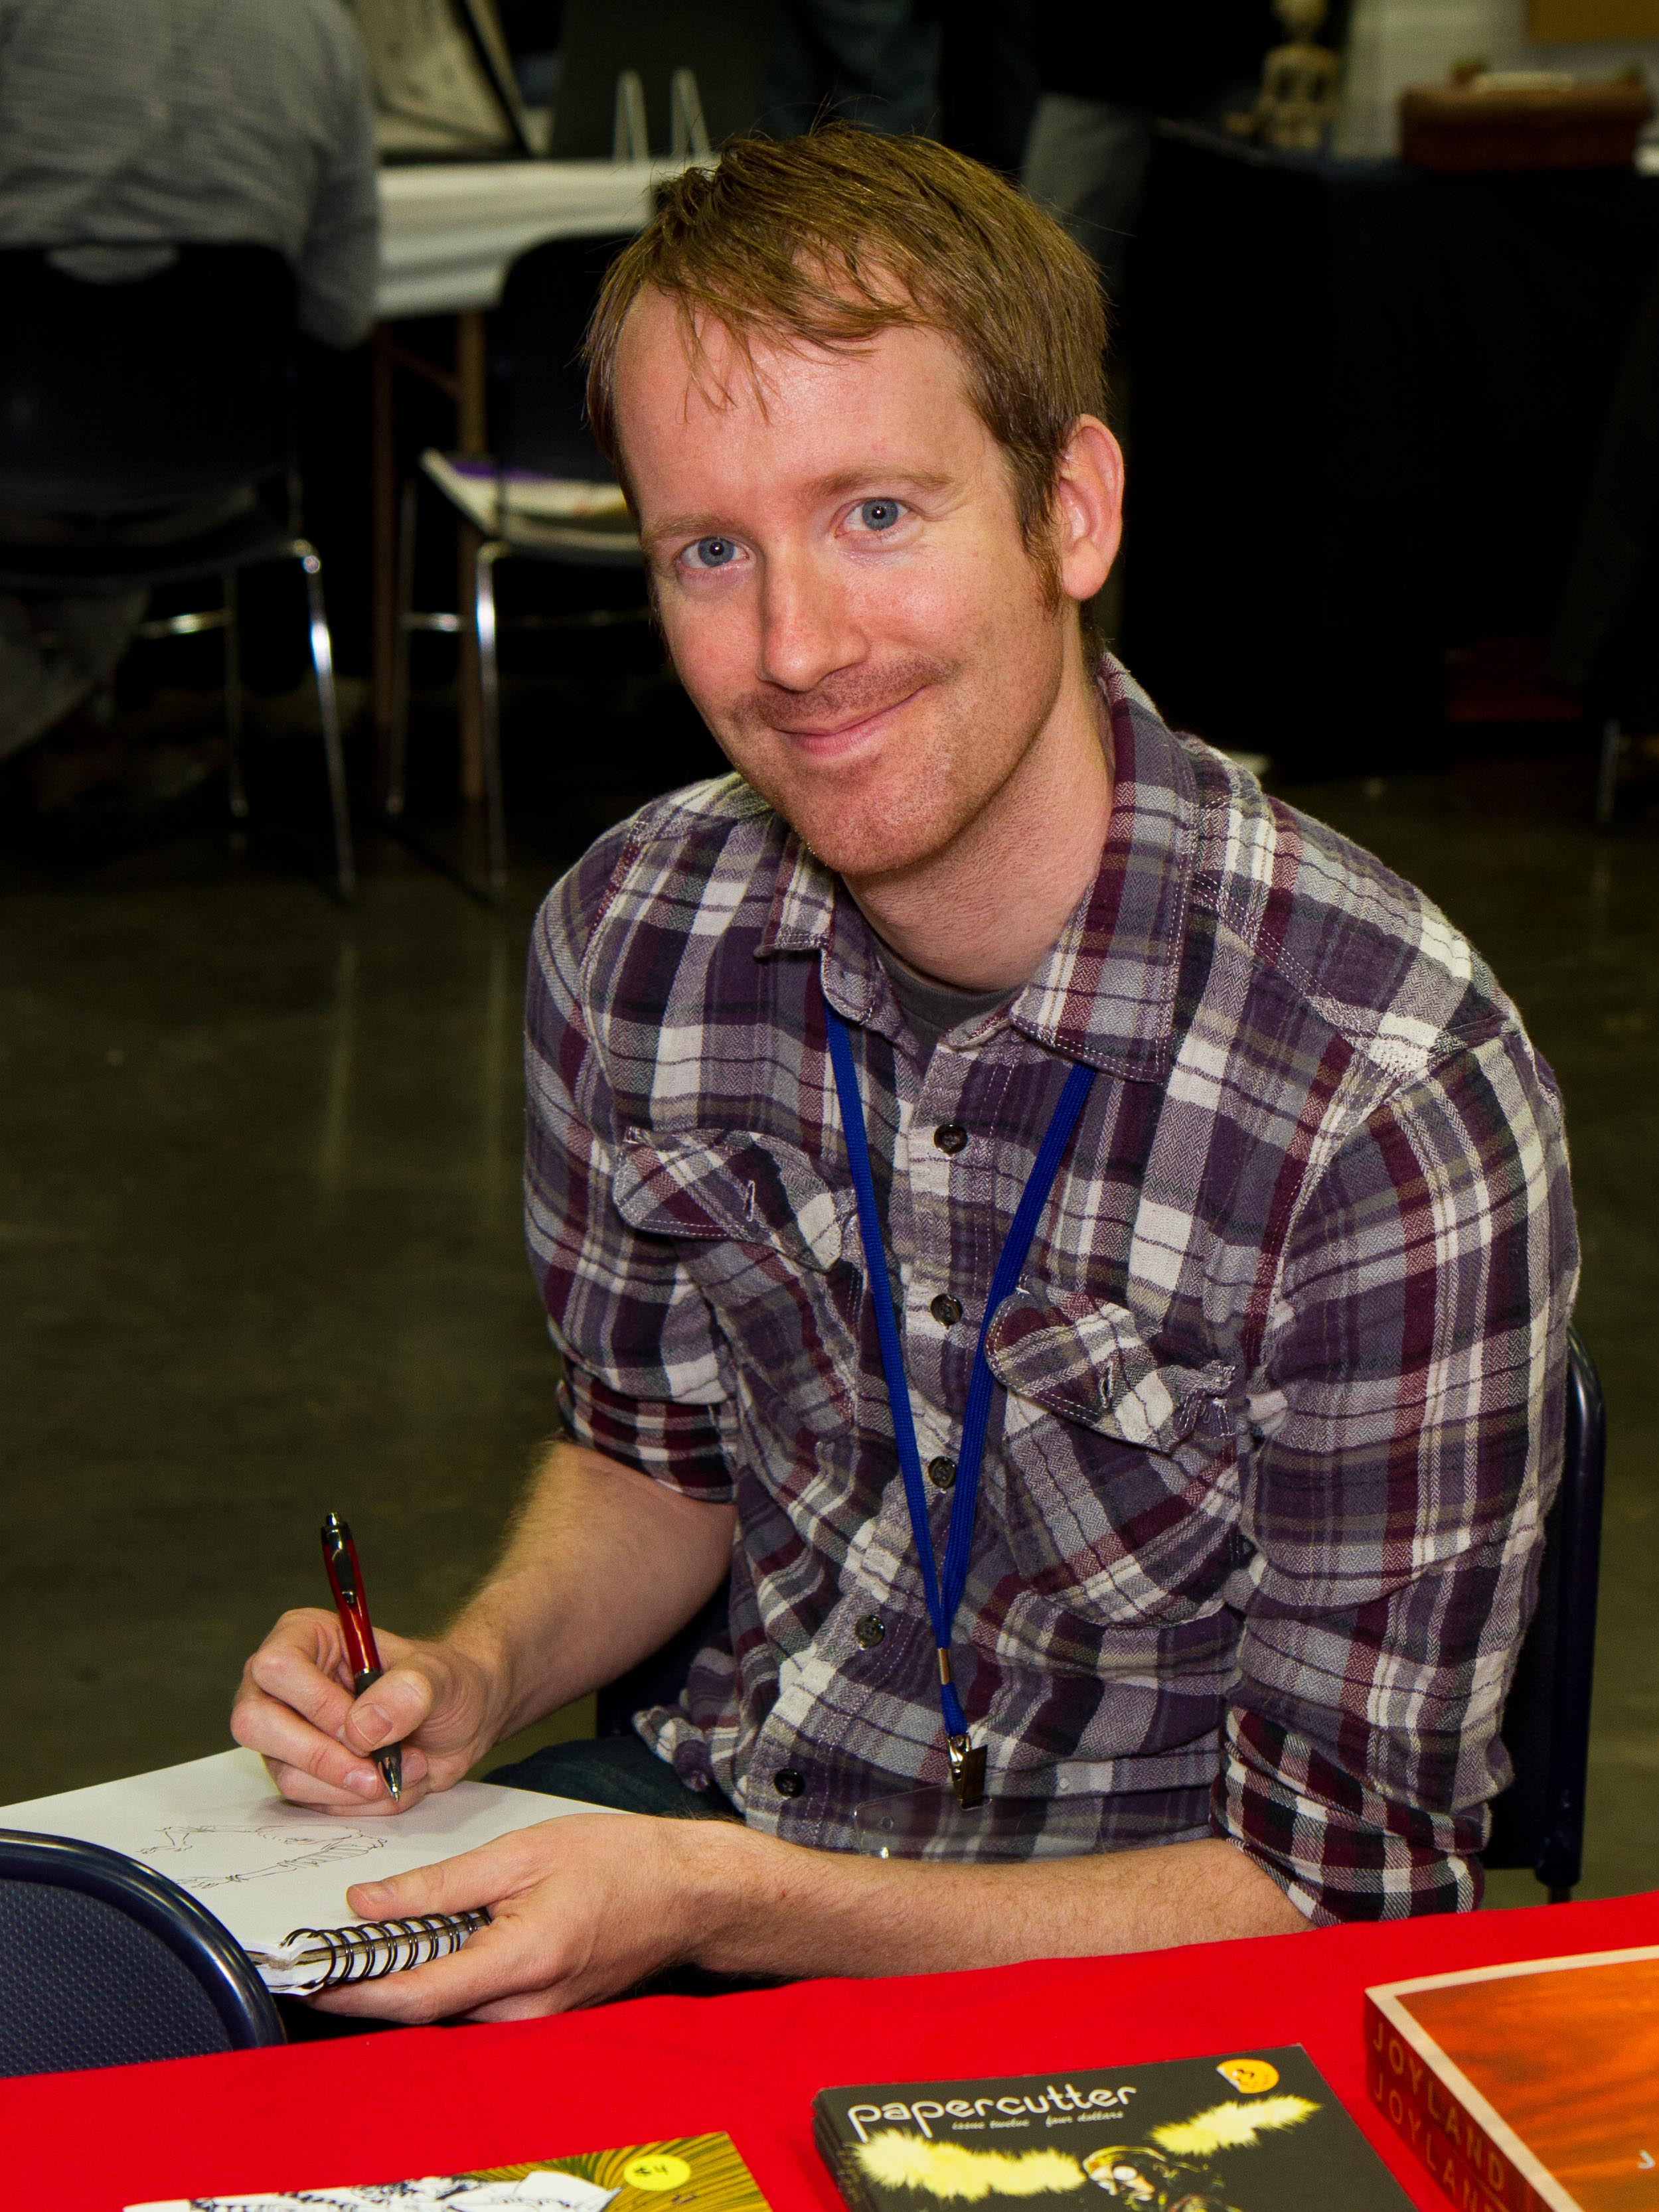 Powell at the 2012 [[Stumptown Comics Fest]]